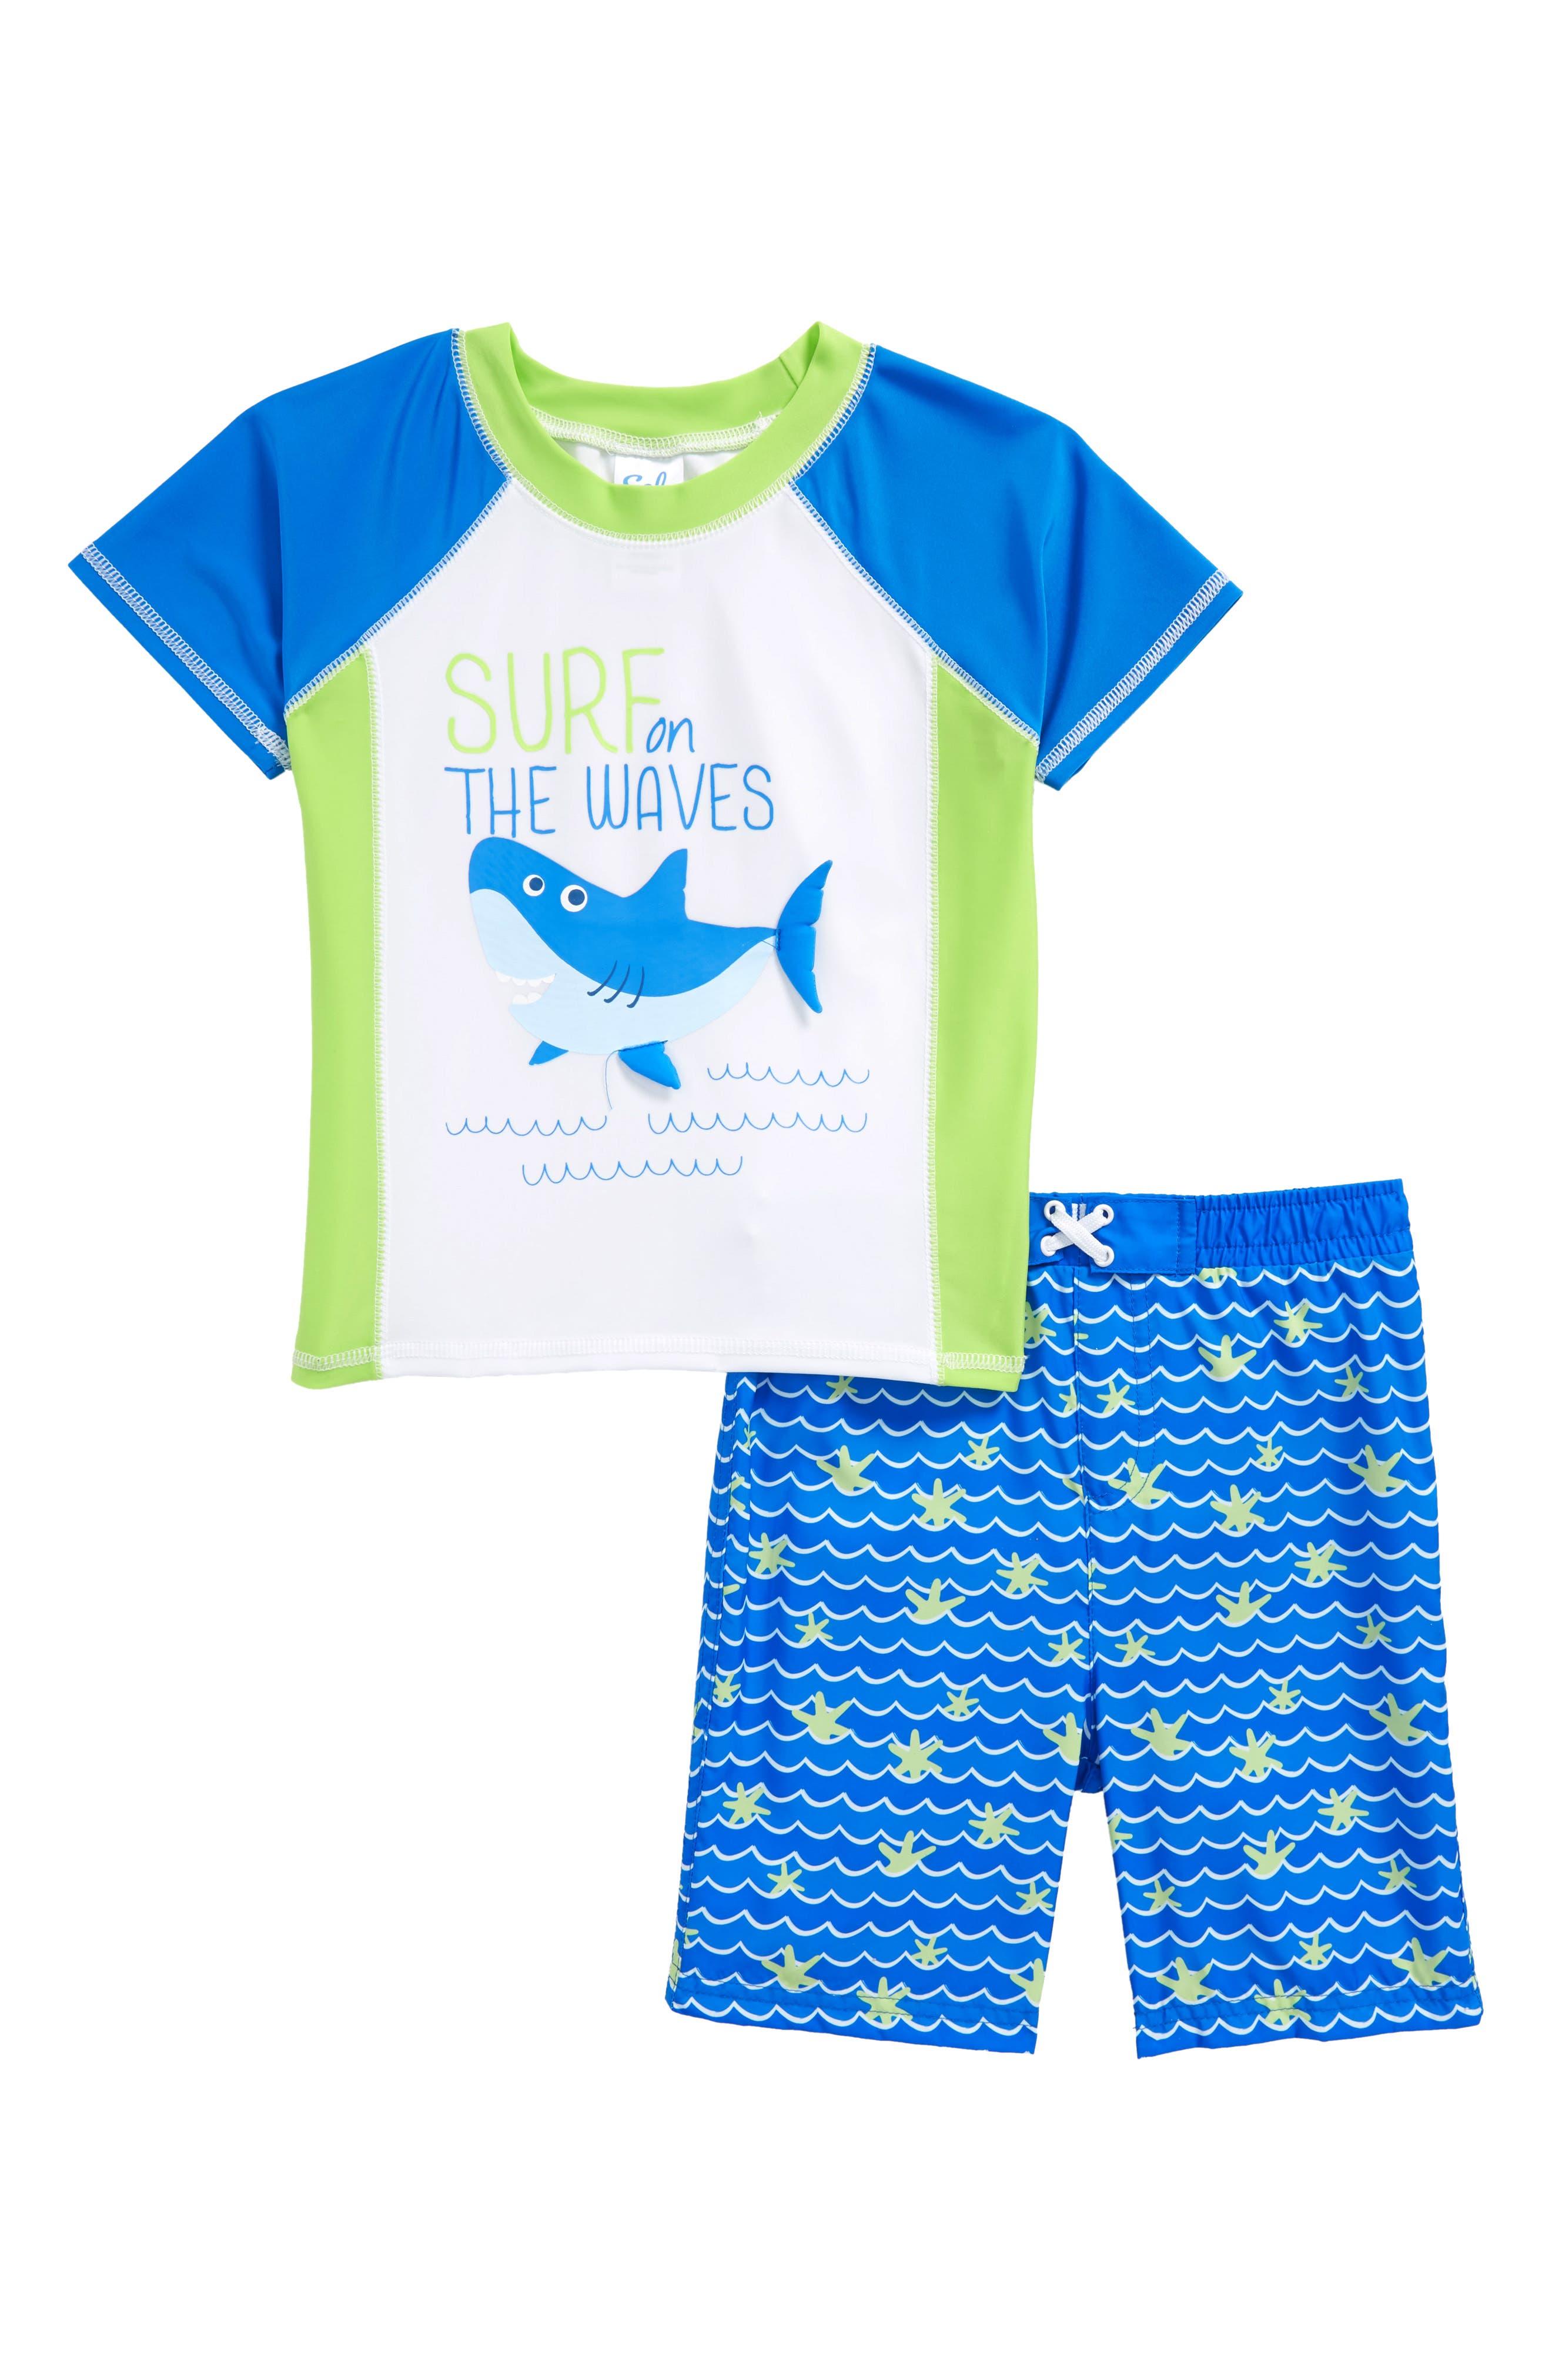 Alternate Image 1 Selected - Sol Swim Shark Surf Two-Piece Rashguard Swimsuit (Toddler Boys & Little Boys)